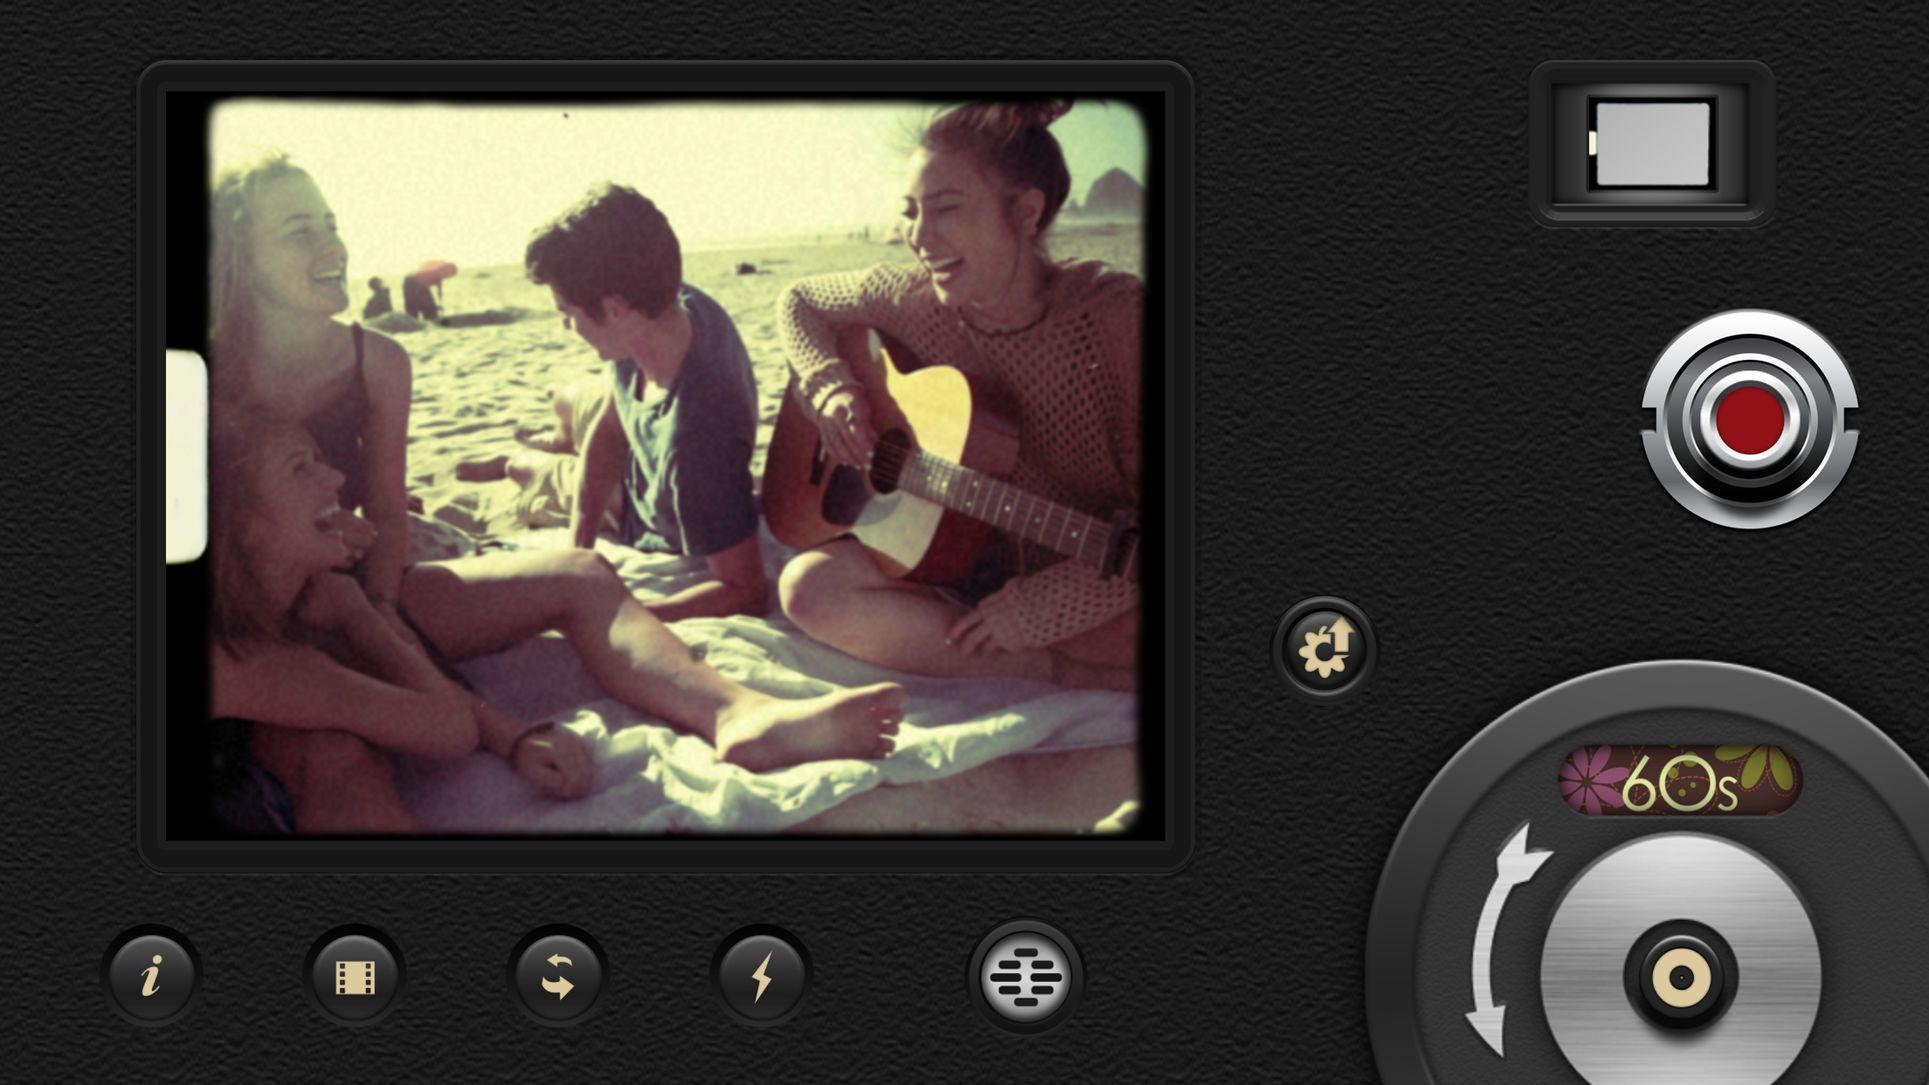 8Mm Vintage Camera 8mm vintage camera #video#amp#ios#lifestyle | vintage camera